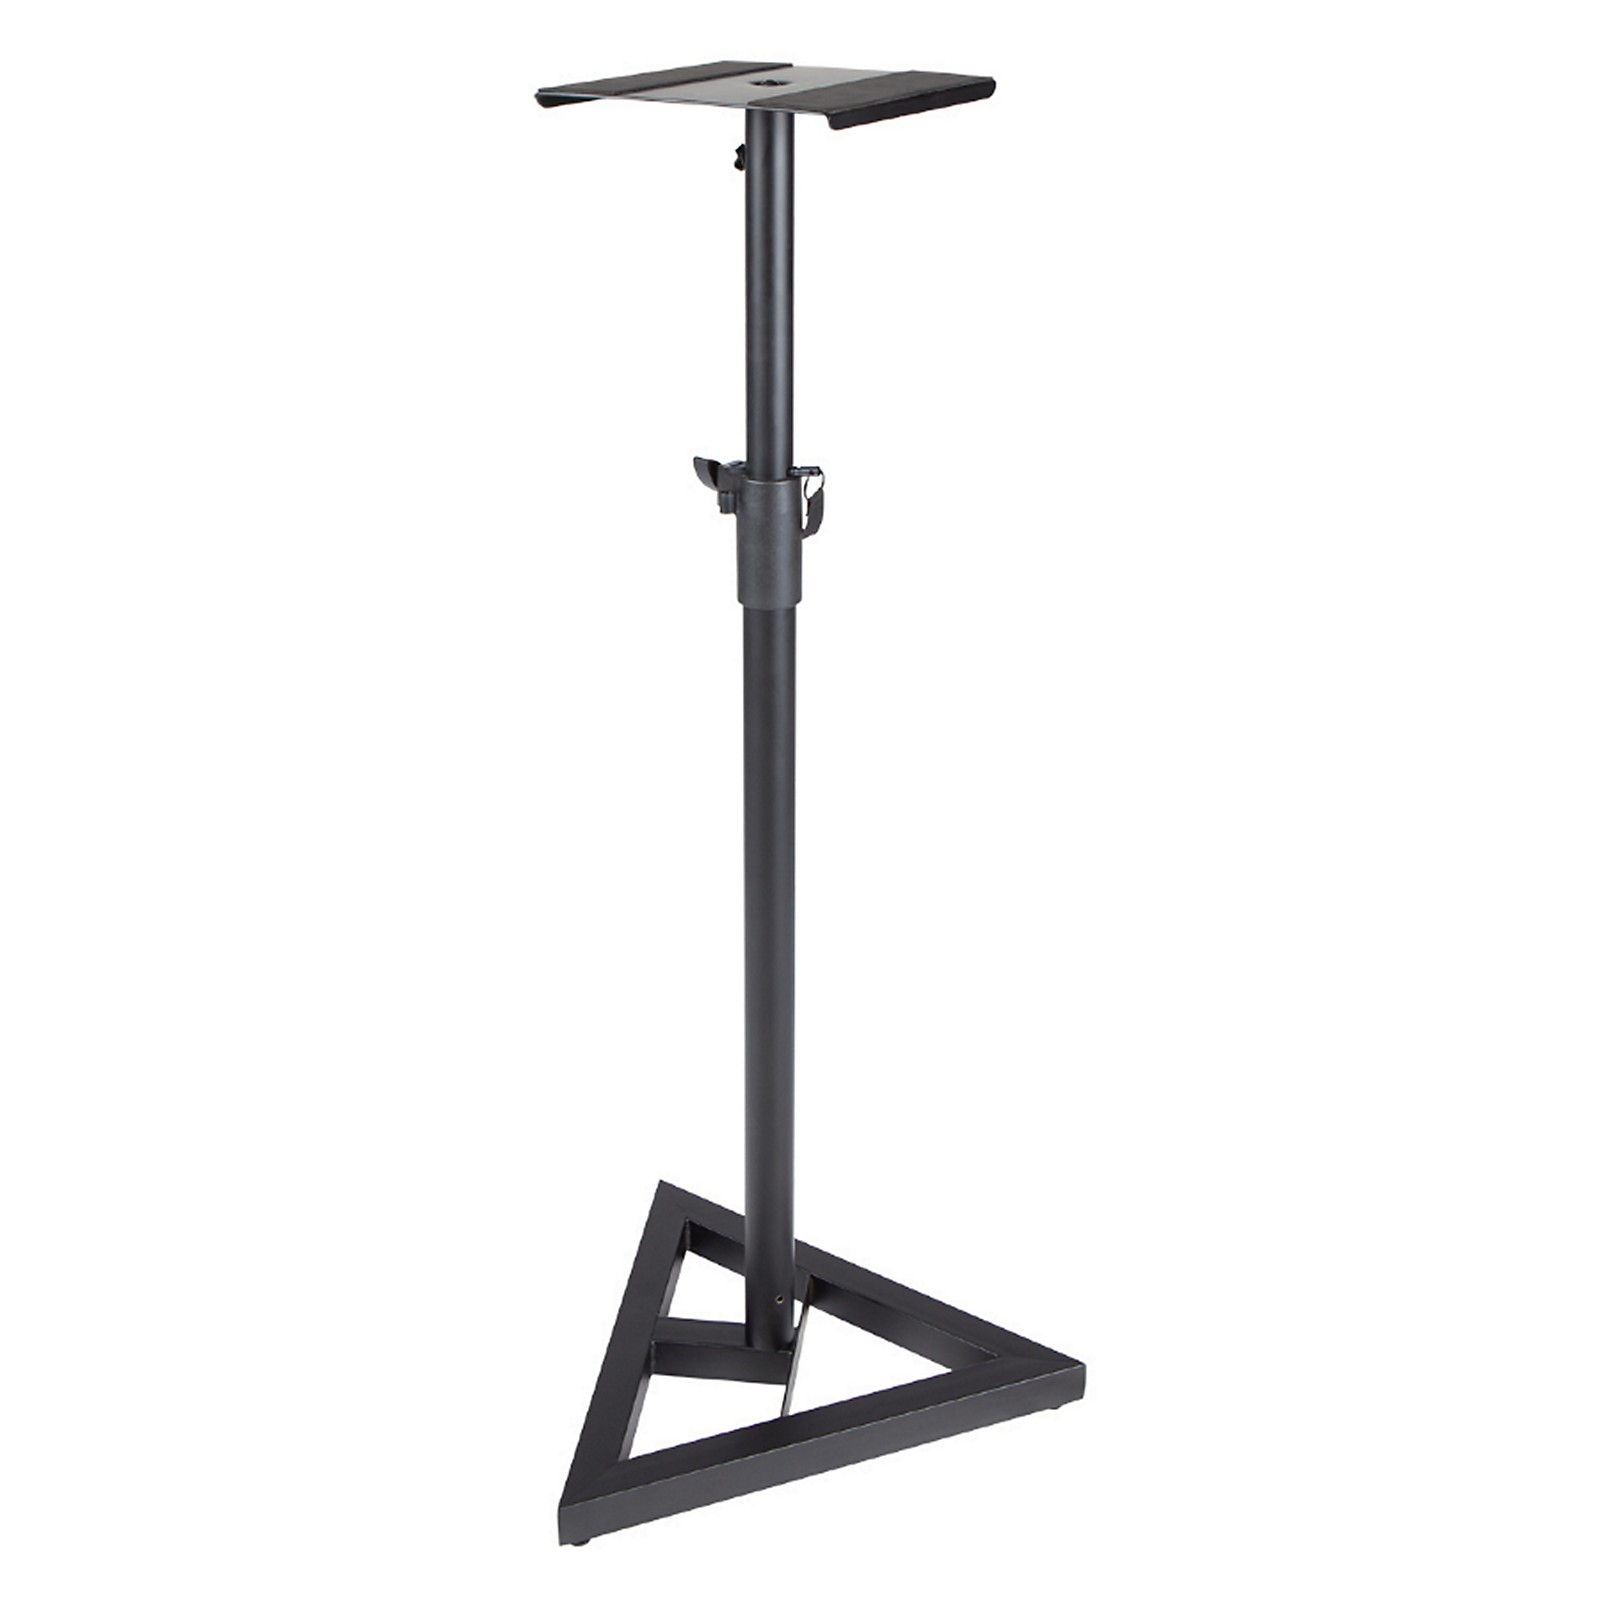 Proline Adjustable Studio Monitor Stand - Pair